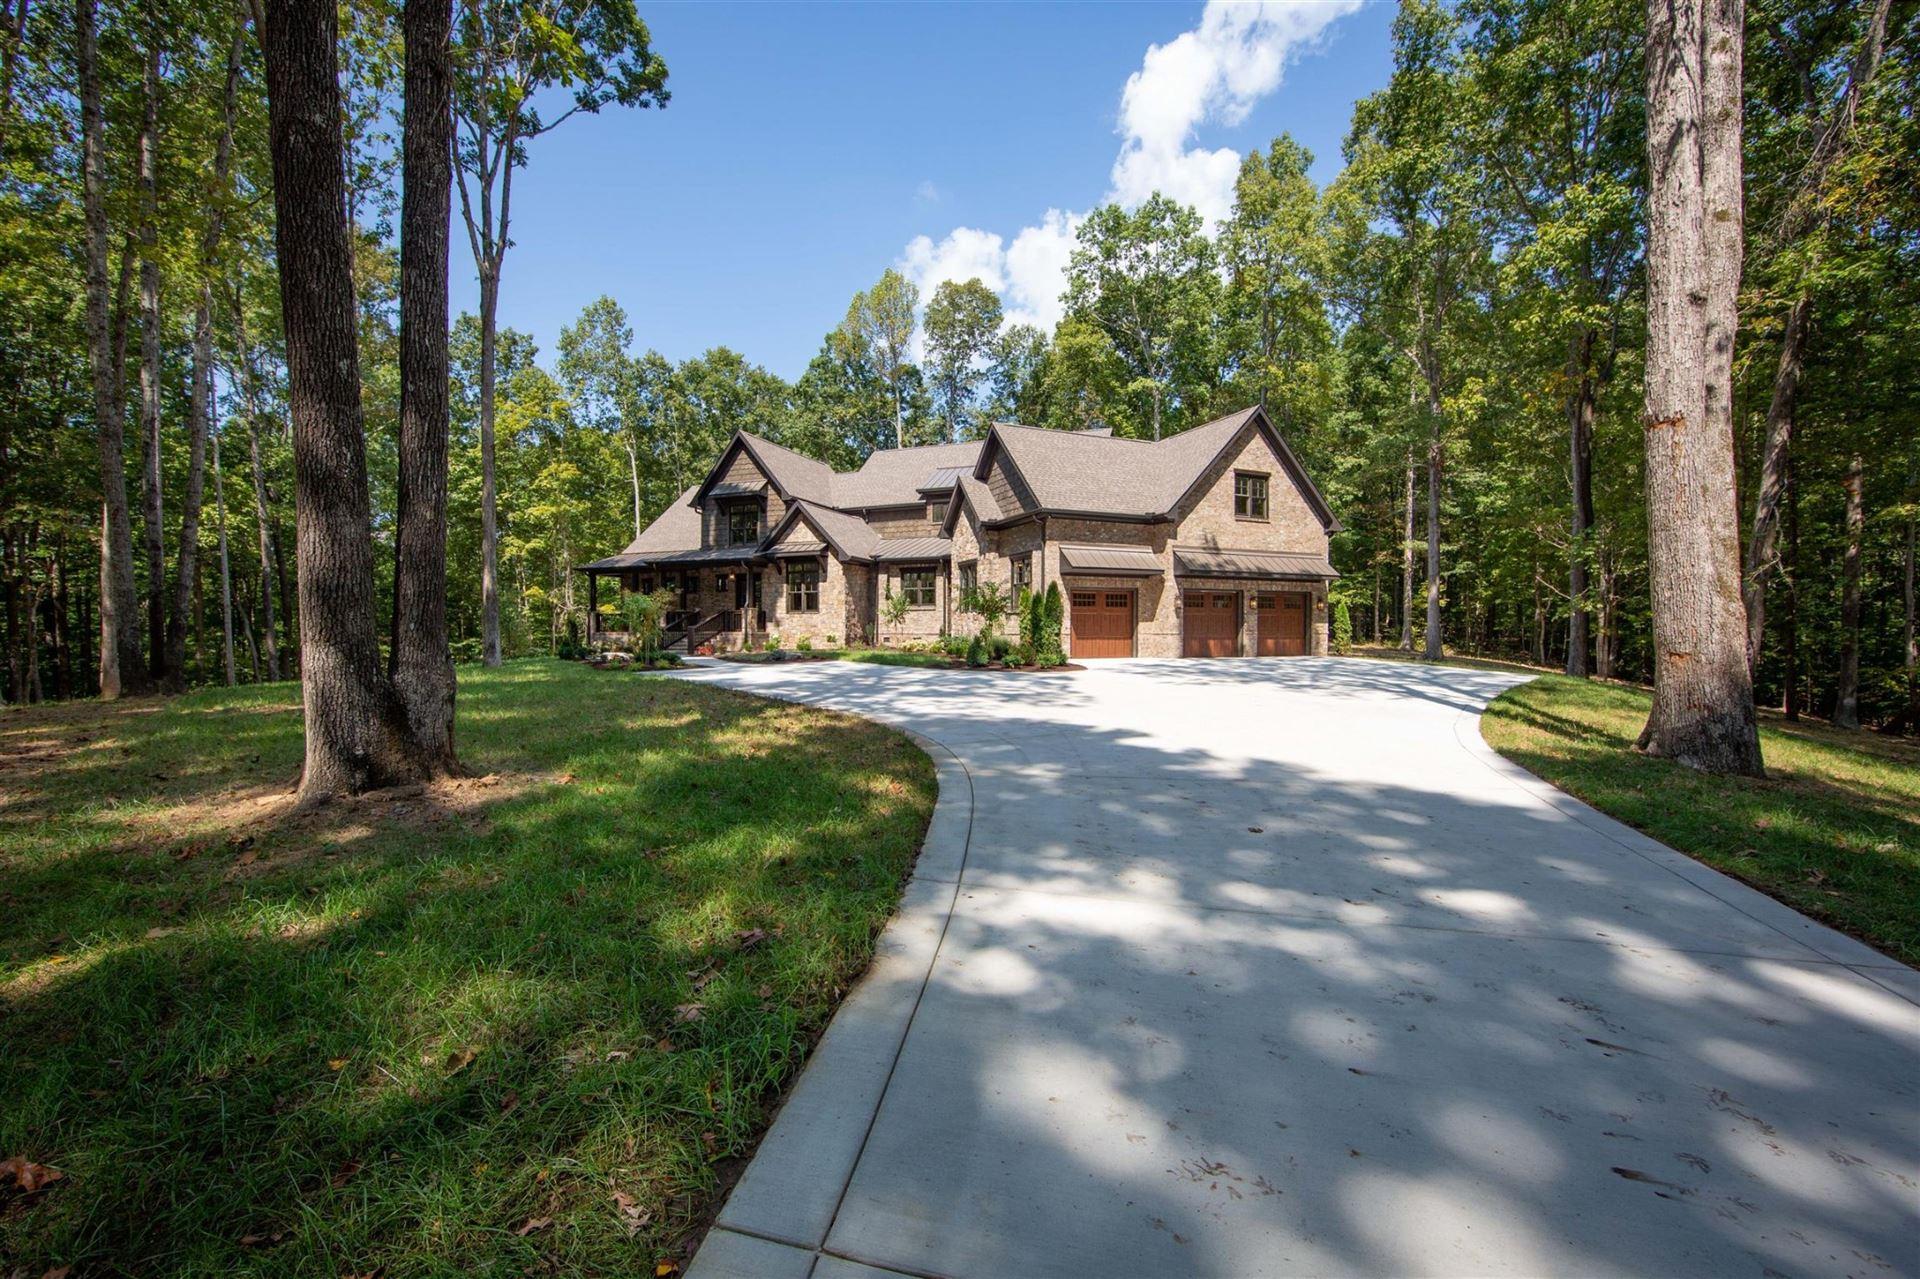 6010 Serene Valley Trail, Franklin, TN 37064 - MLS#: 2157594